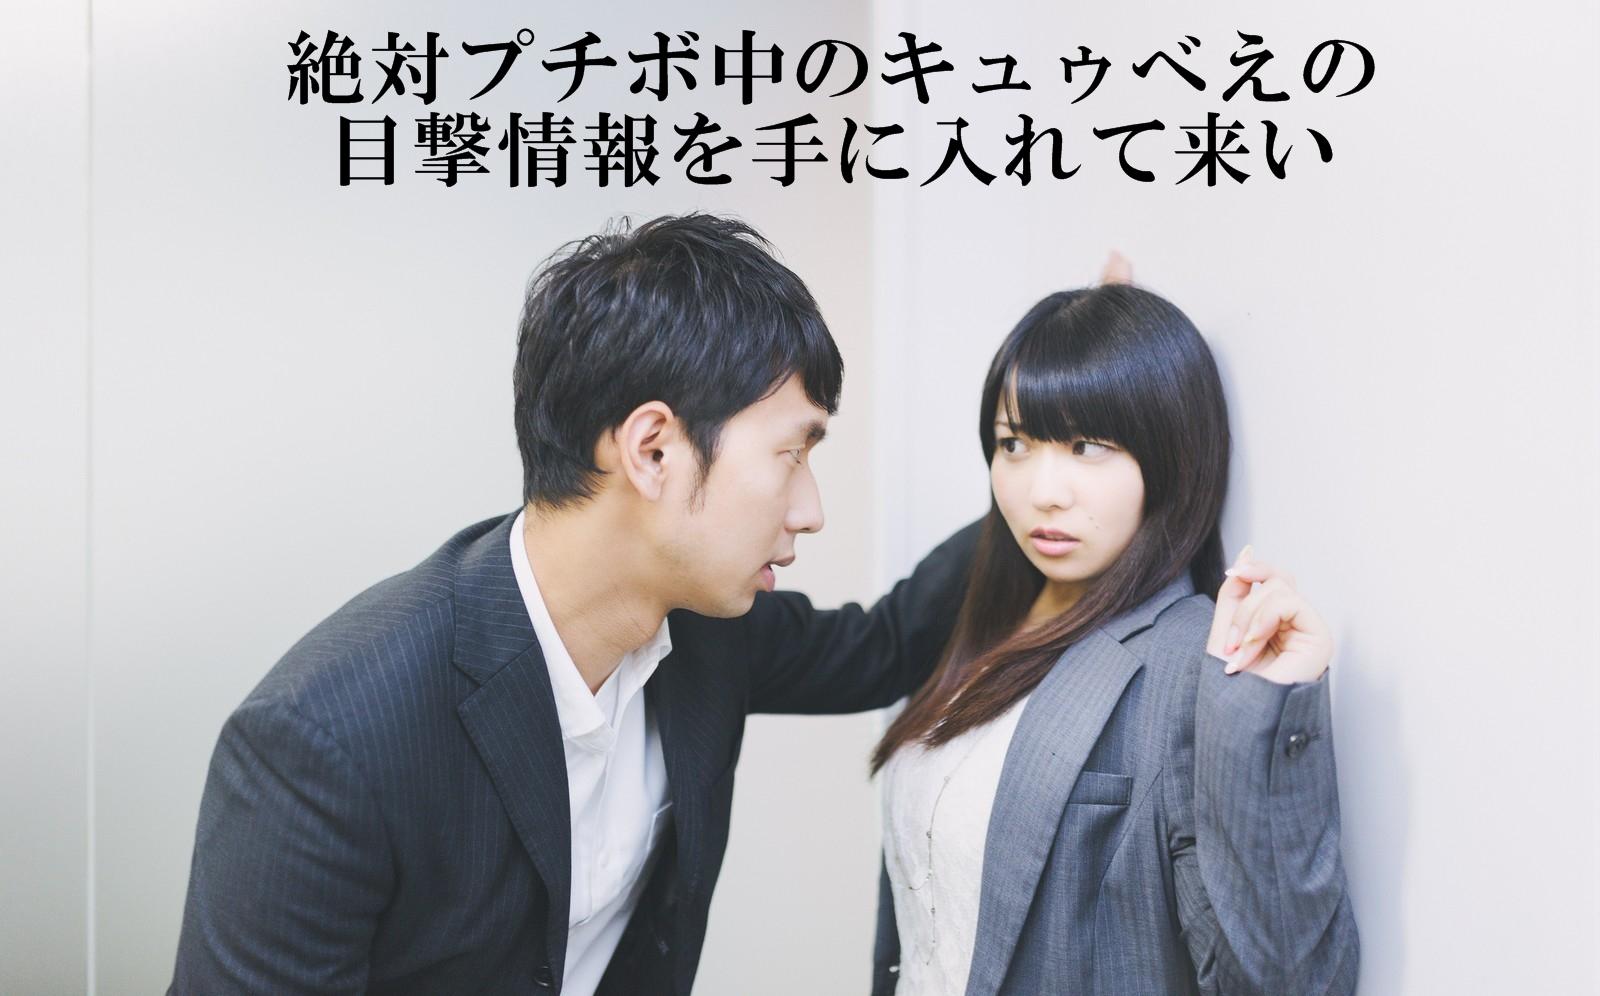 PAK85_otonashikushiyagaredon20140830184335_TP_V